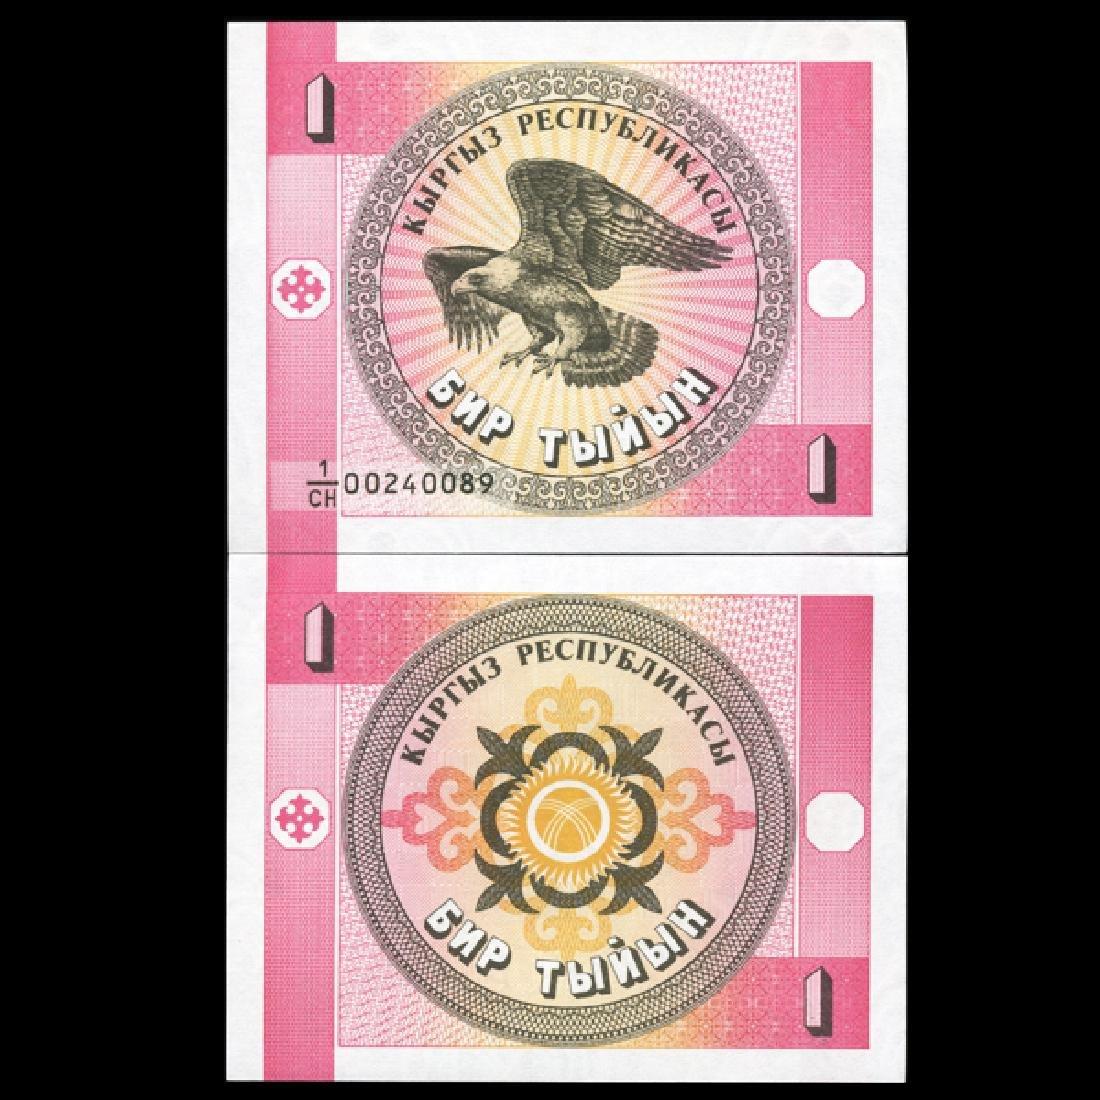 1993 Kyrgyzstan 1 Tyiyn Note GEM Crisp Unc